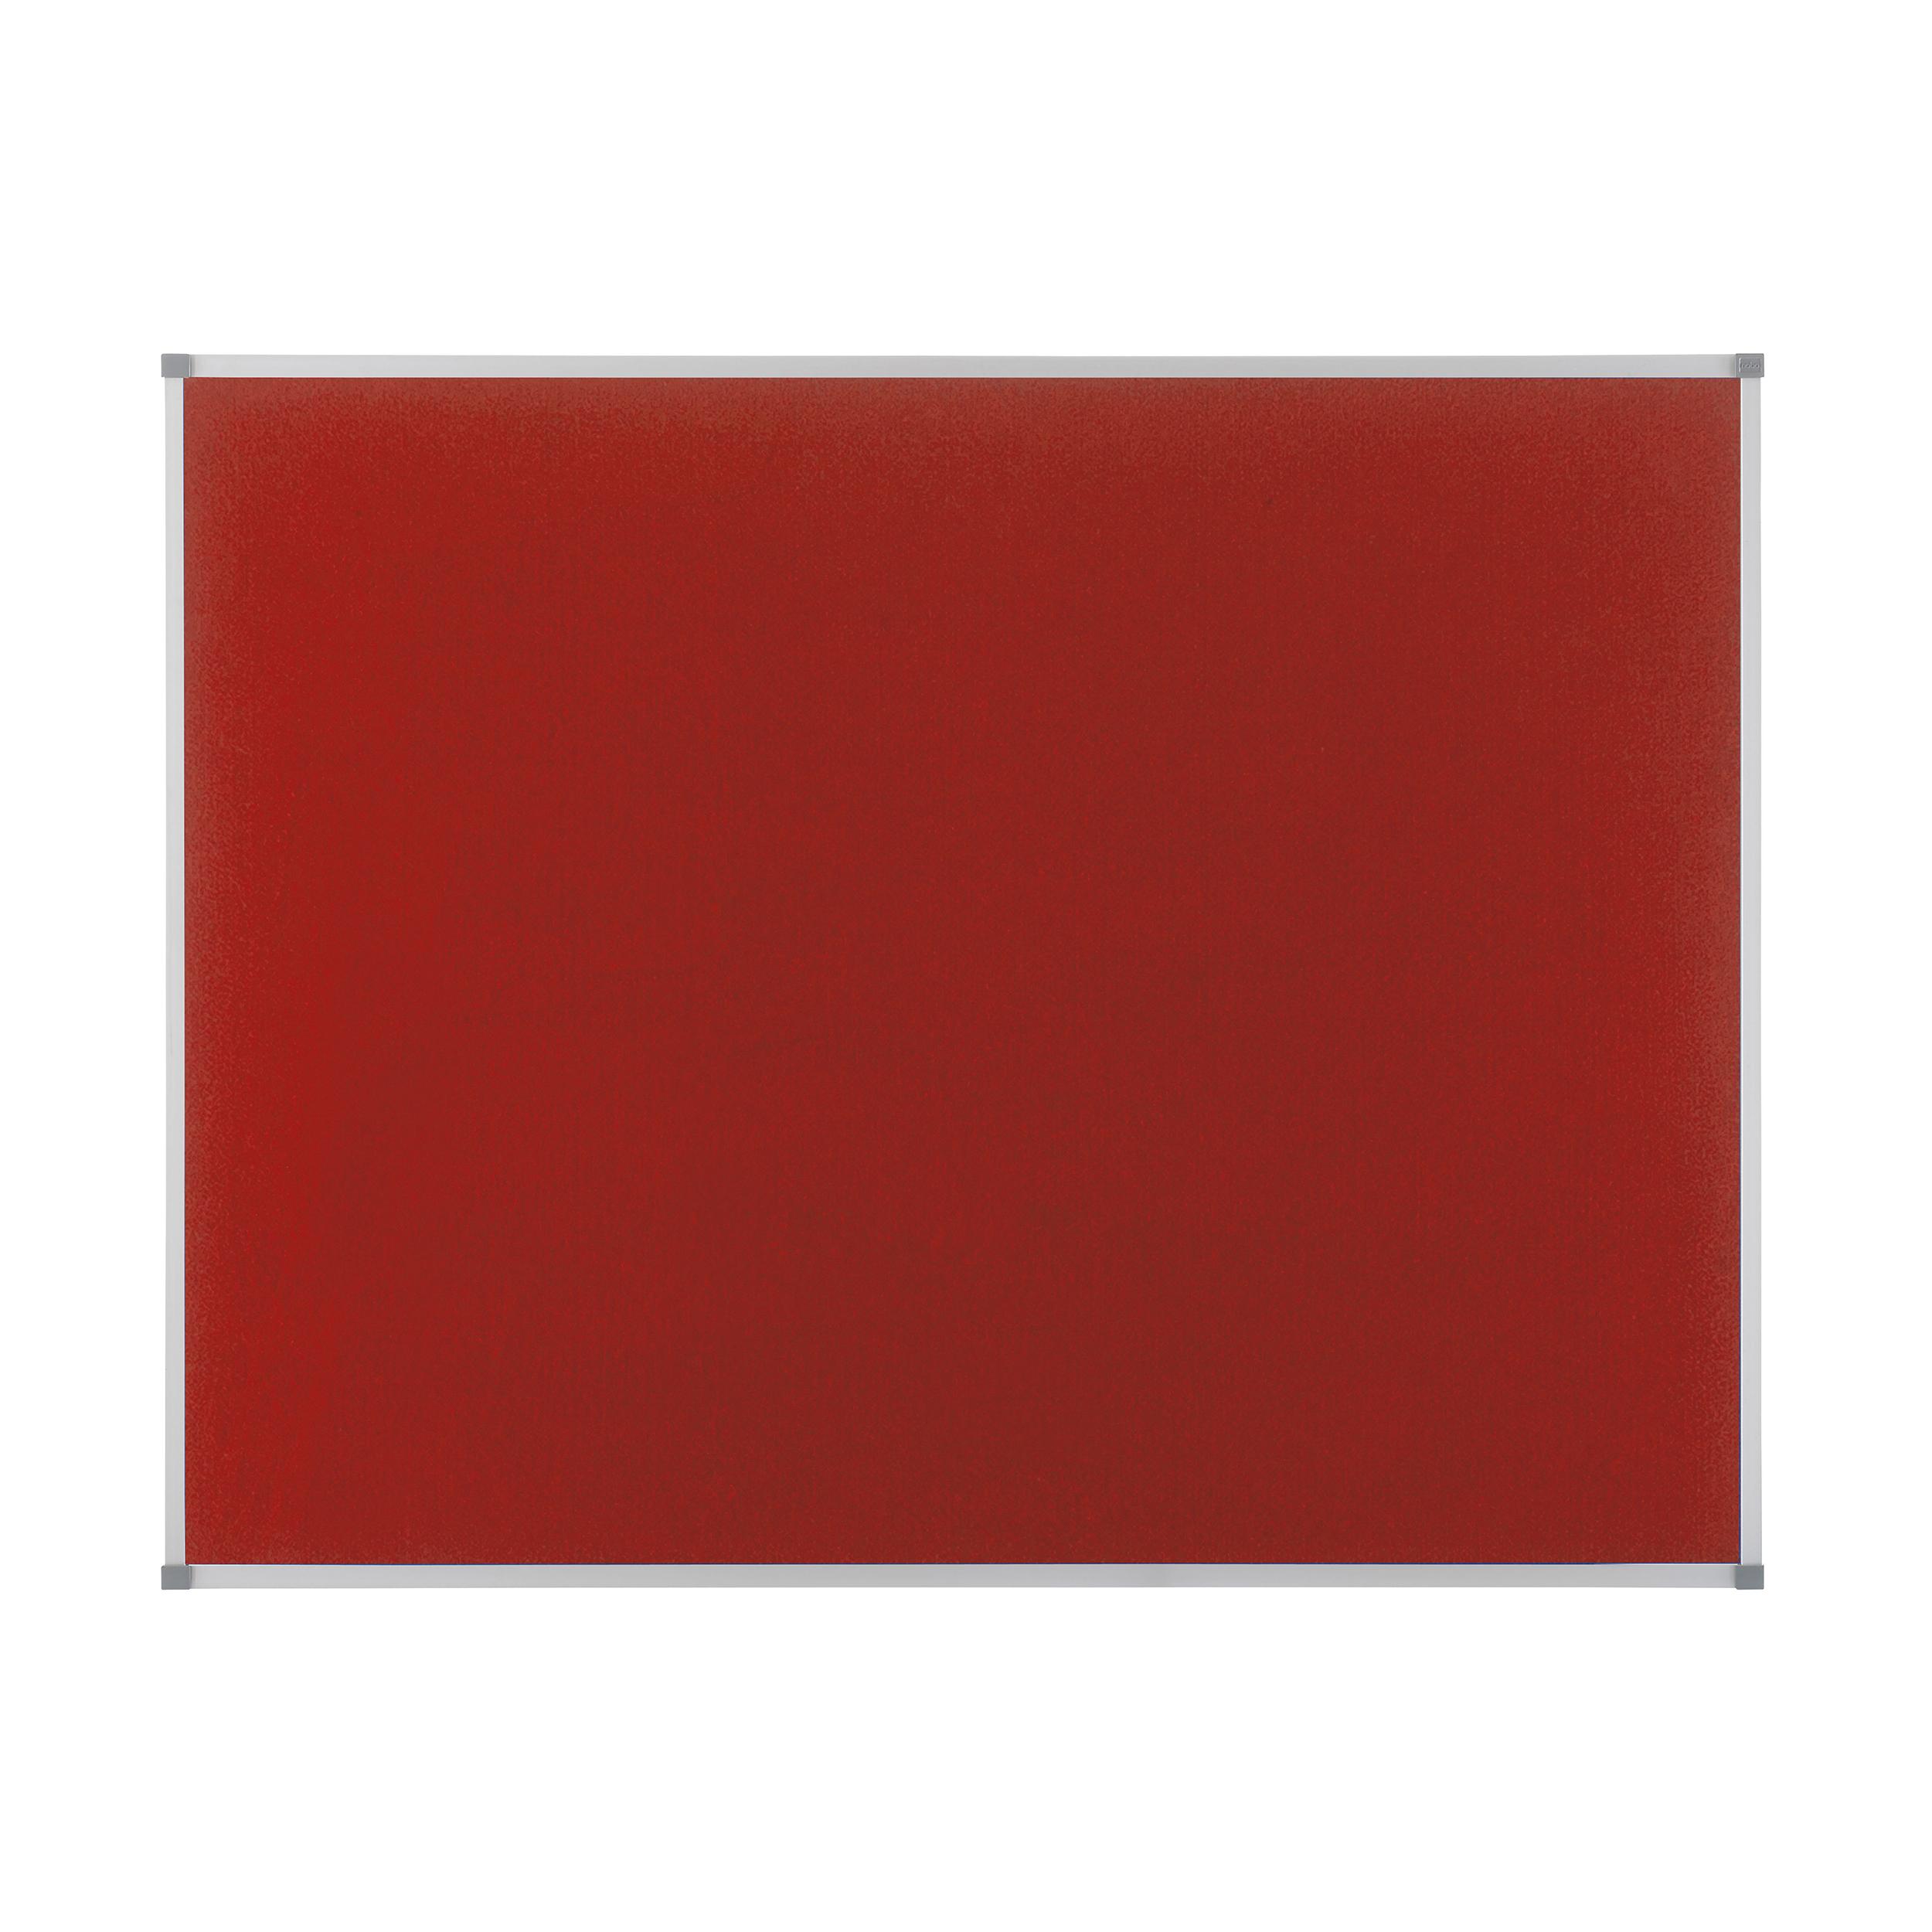 Felt Nobo Classic Noticeboard Felt with Aluminium Frame W900xH600mm Red Ref 1902259